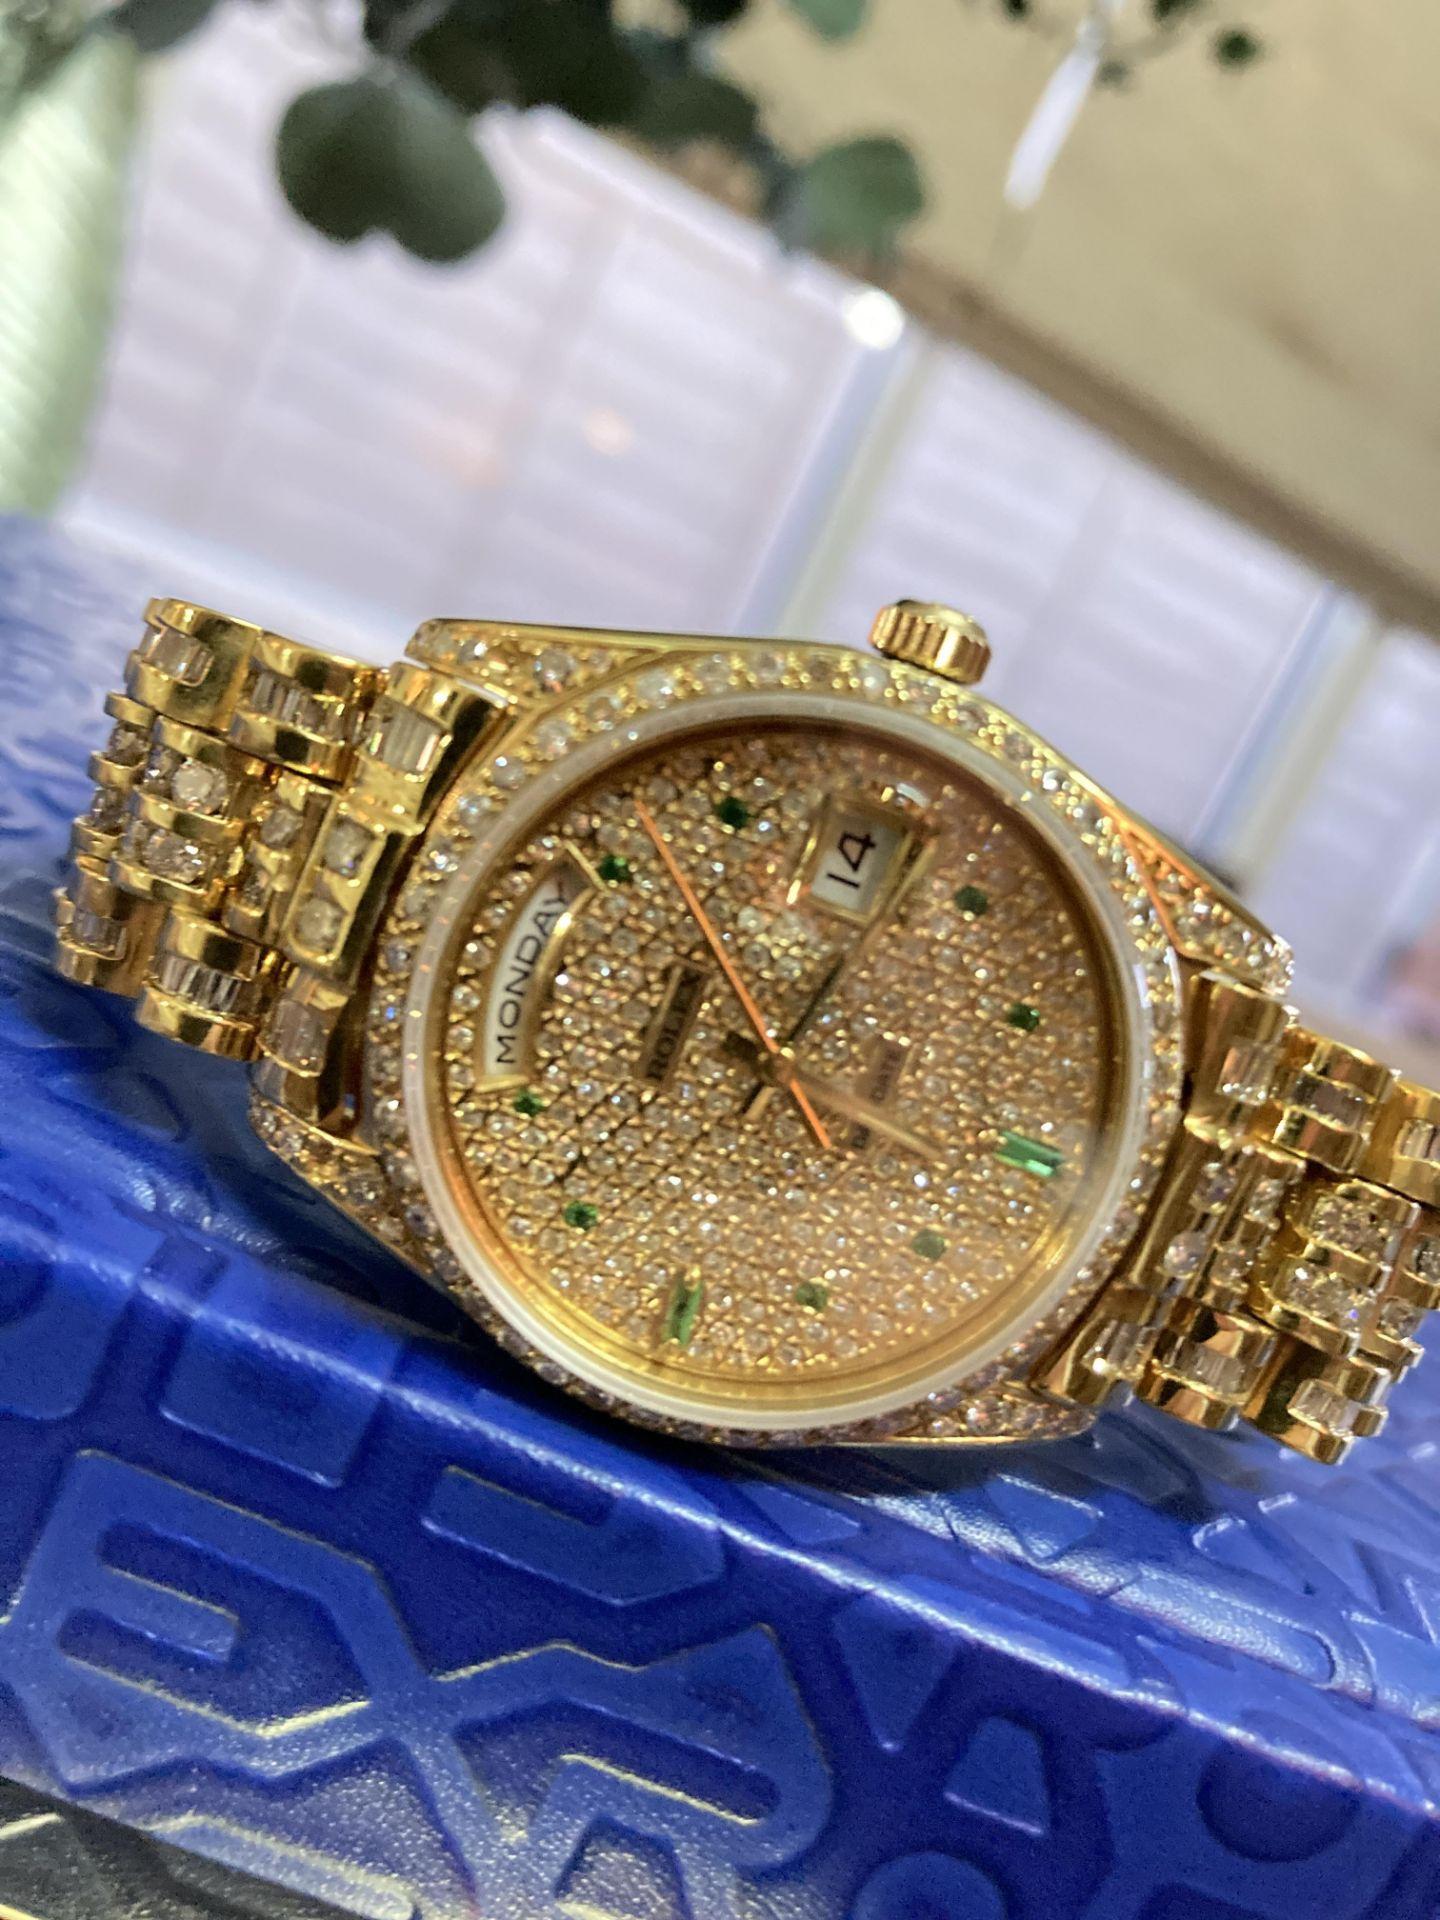 GENTS 36mm ROLEX DAYDATE YELLOW GOLD DIAMOND WATCH - Image 20 of 21